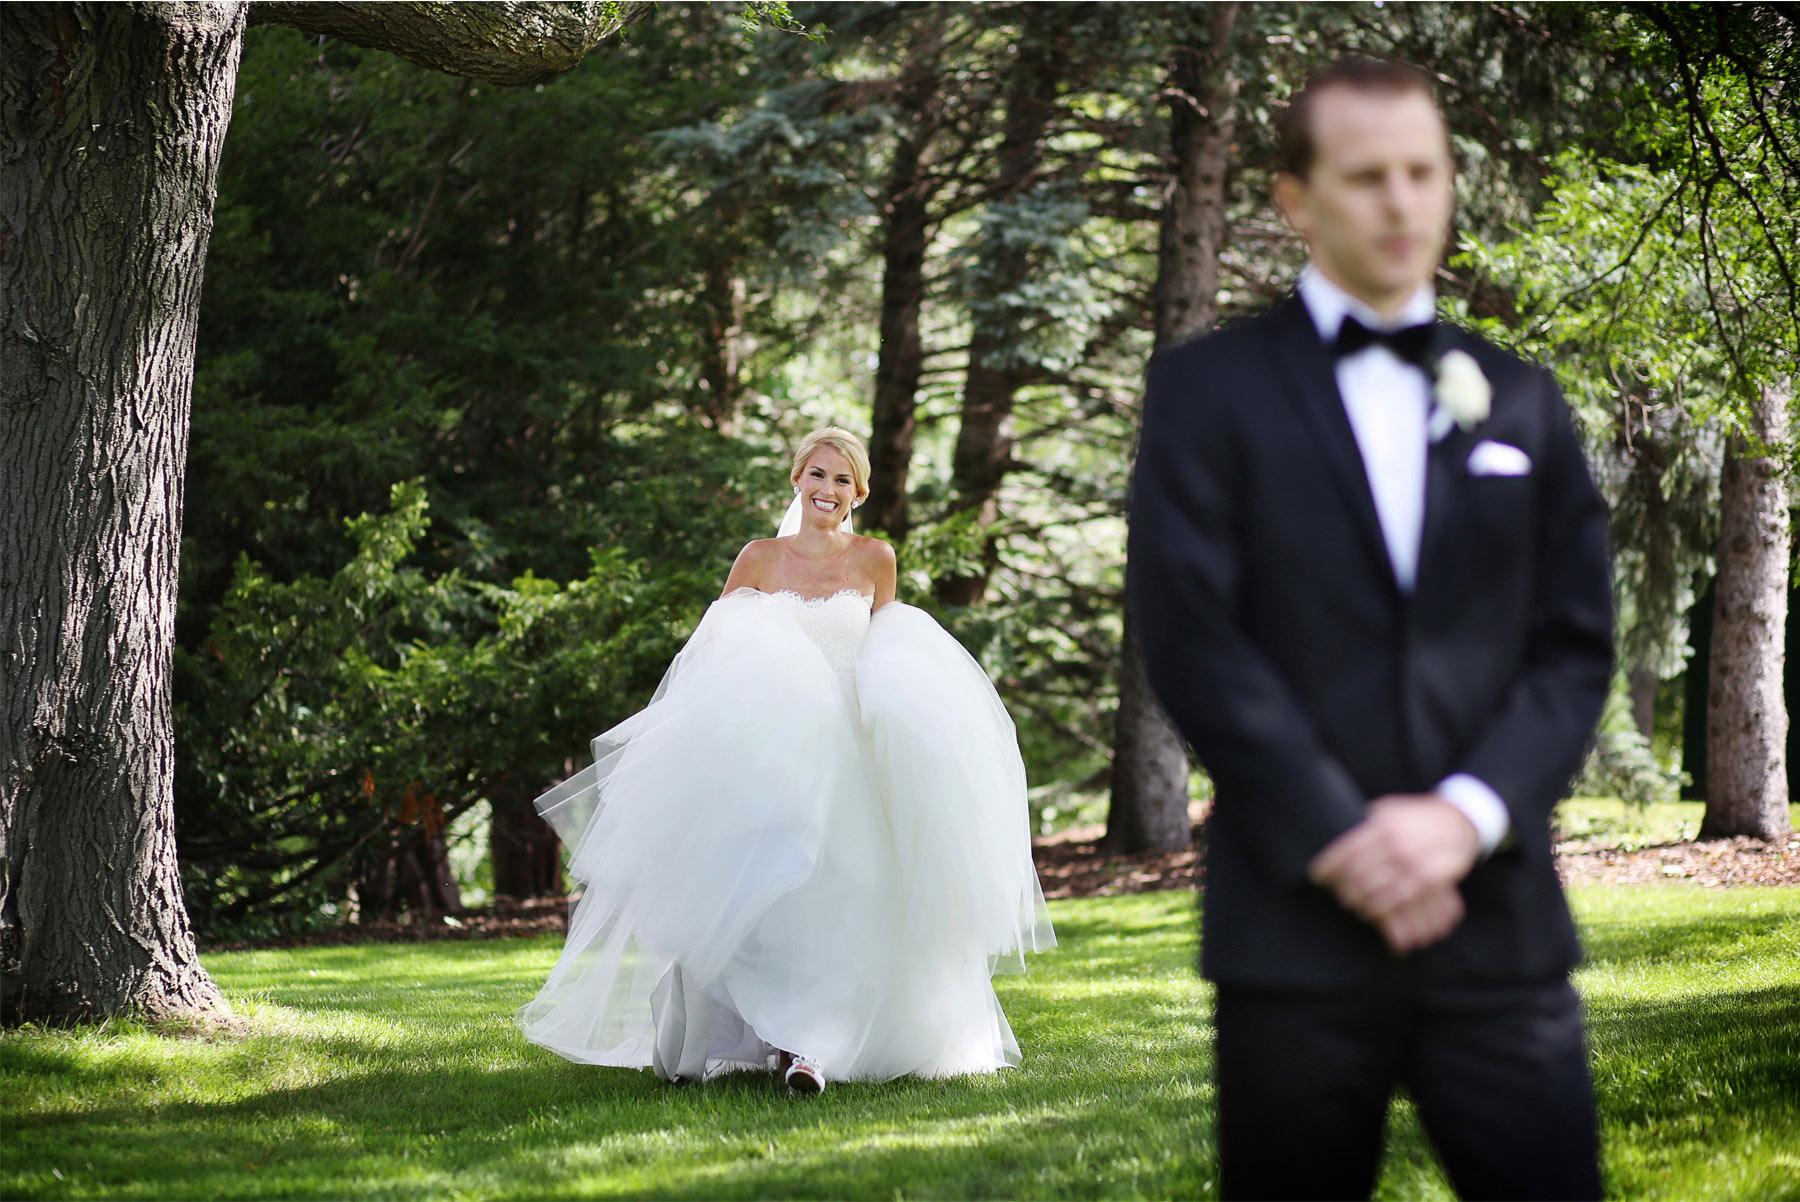 04-Minneapolis-Minnesota-Wedding-Photography-by-Vick-Photography-First-Look-Garden-Sarah-&-Brett.jpg